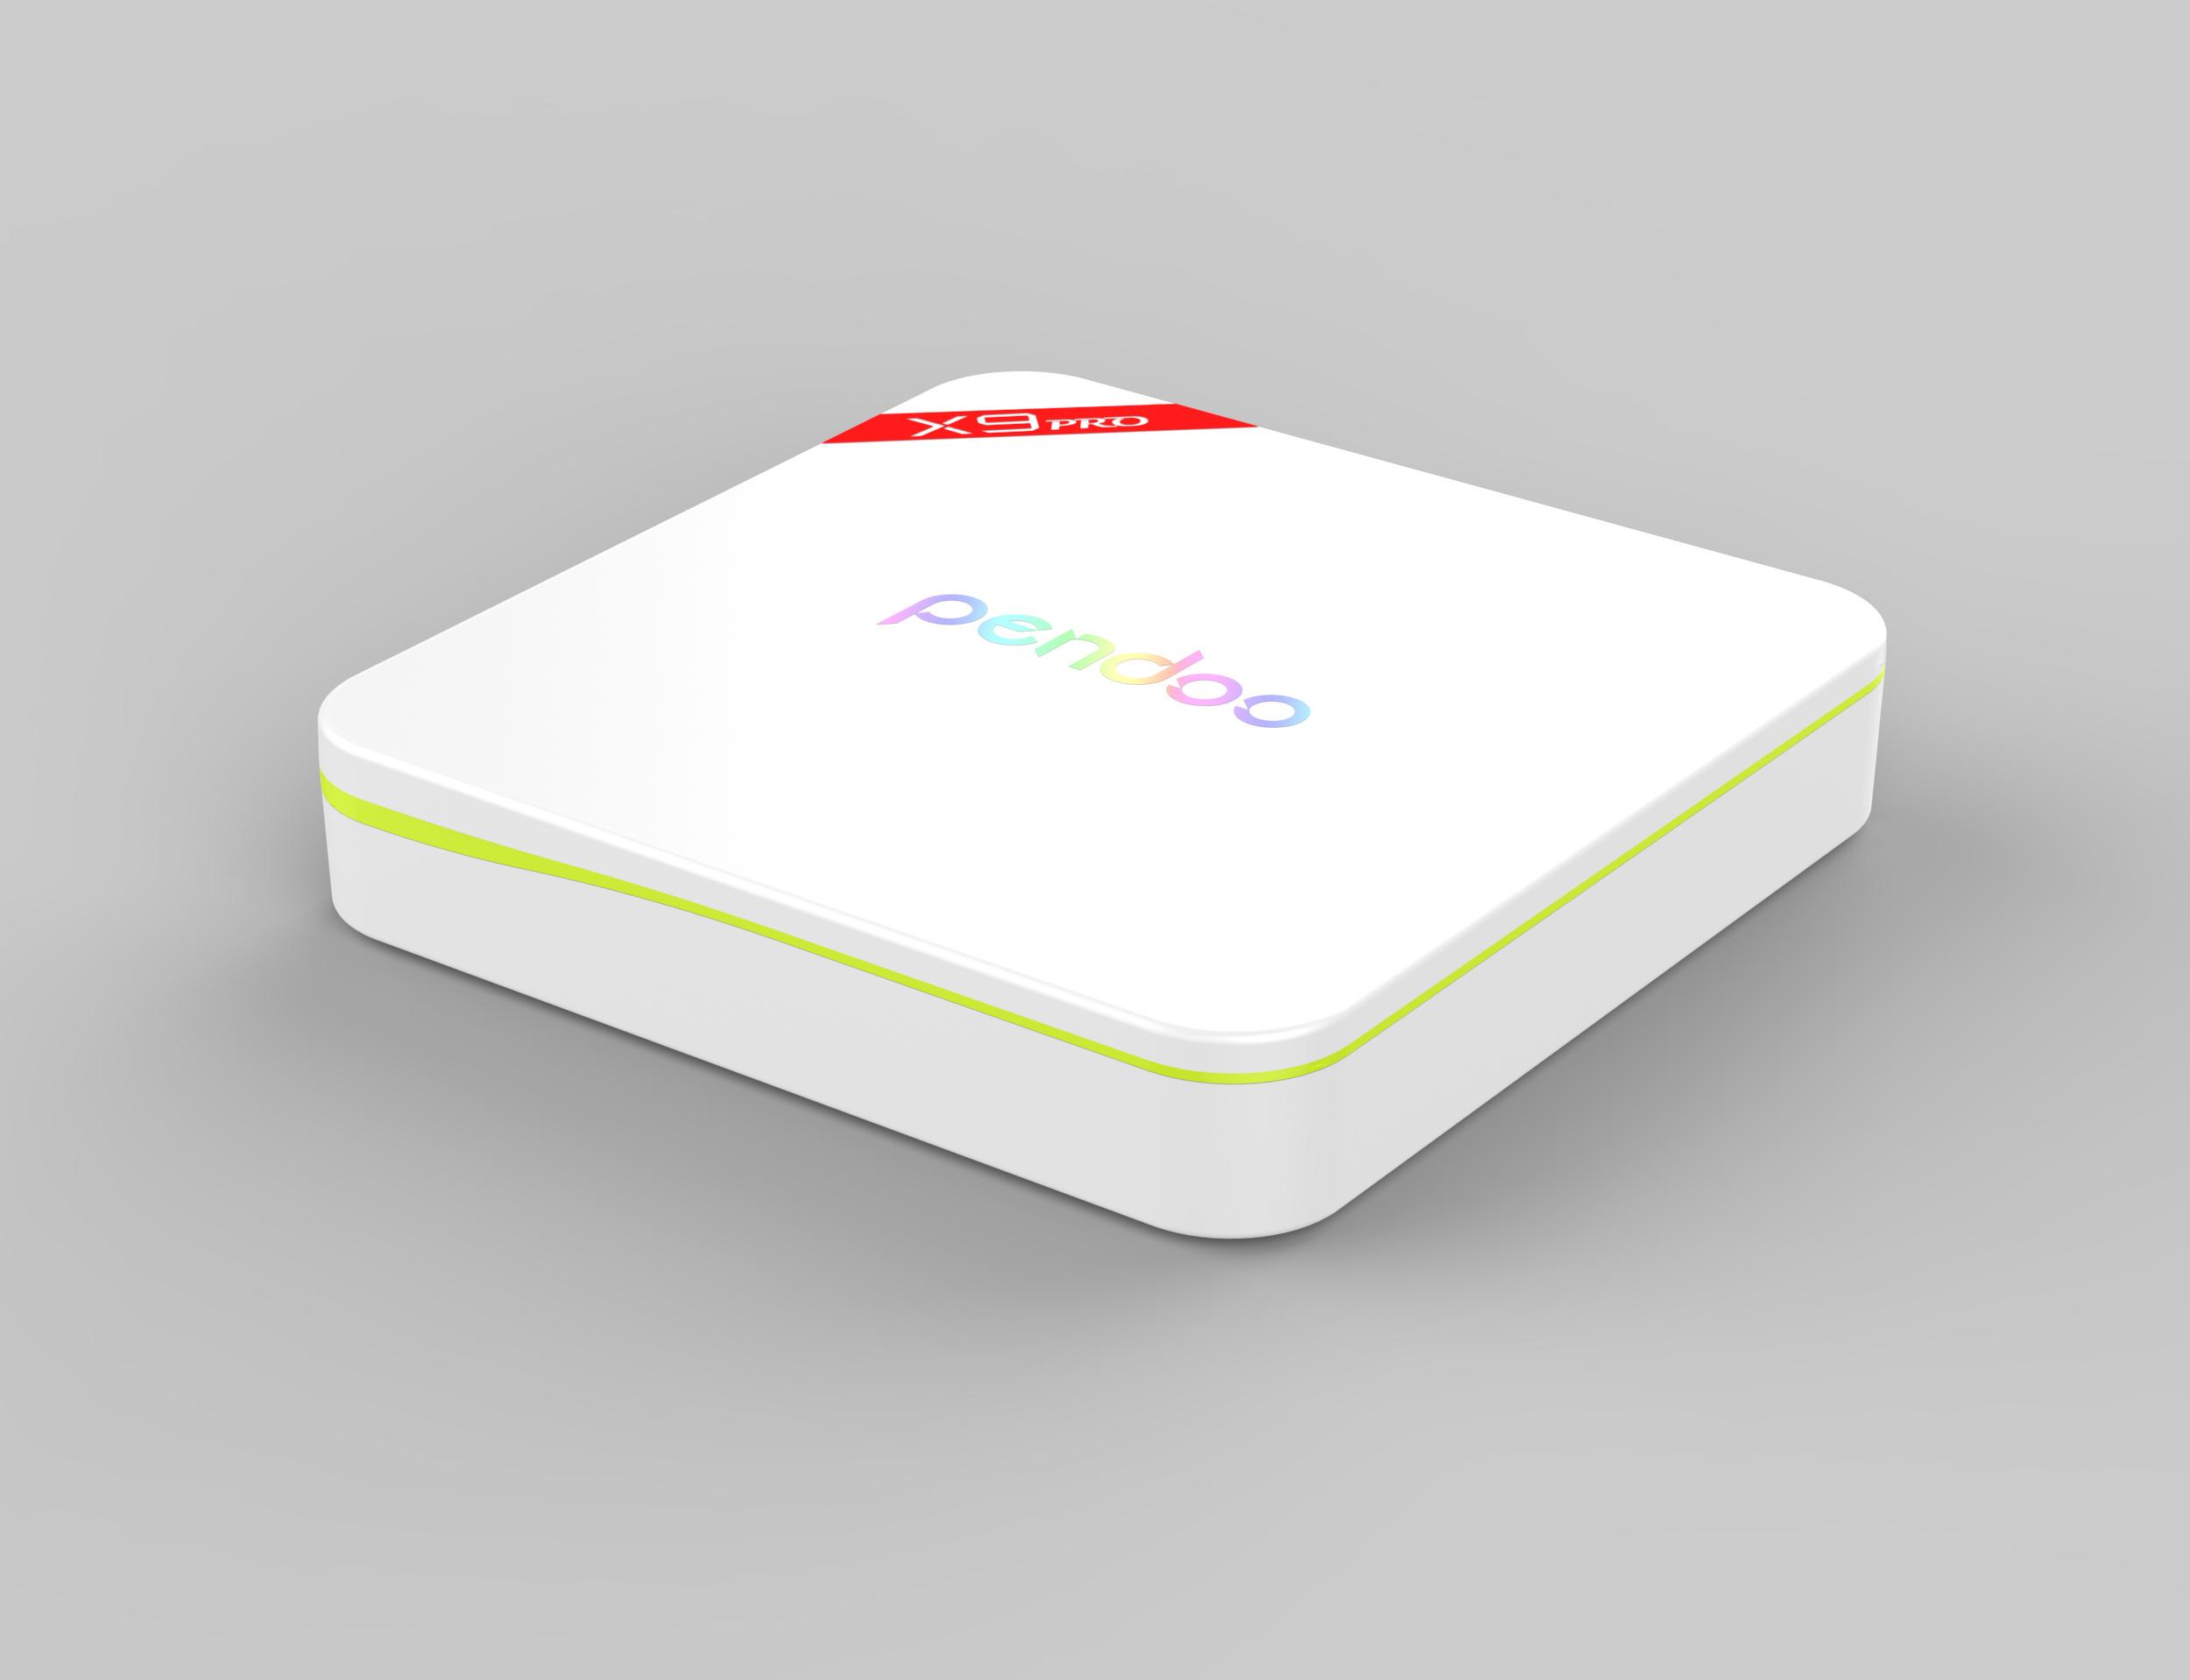 New Model Pendoo X9 PRO Amlogic S912 Octa Core Android 6.0 Smart TV Box Kodi 17.0